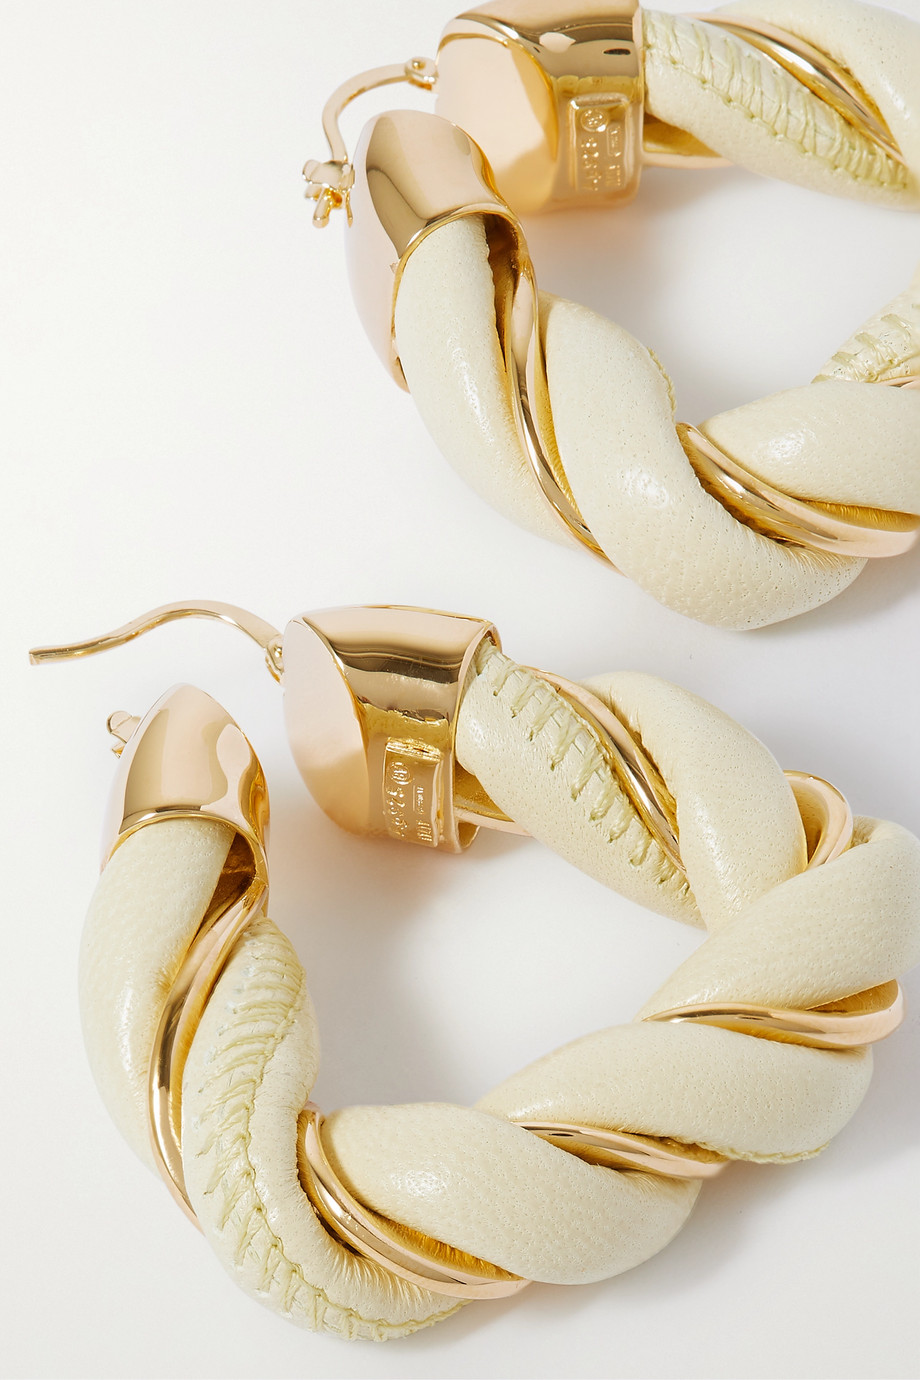 Bottega Veneta Square Twist gold-plated and leather hoop earrings